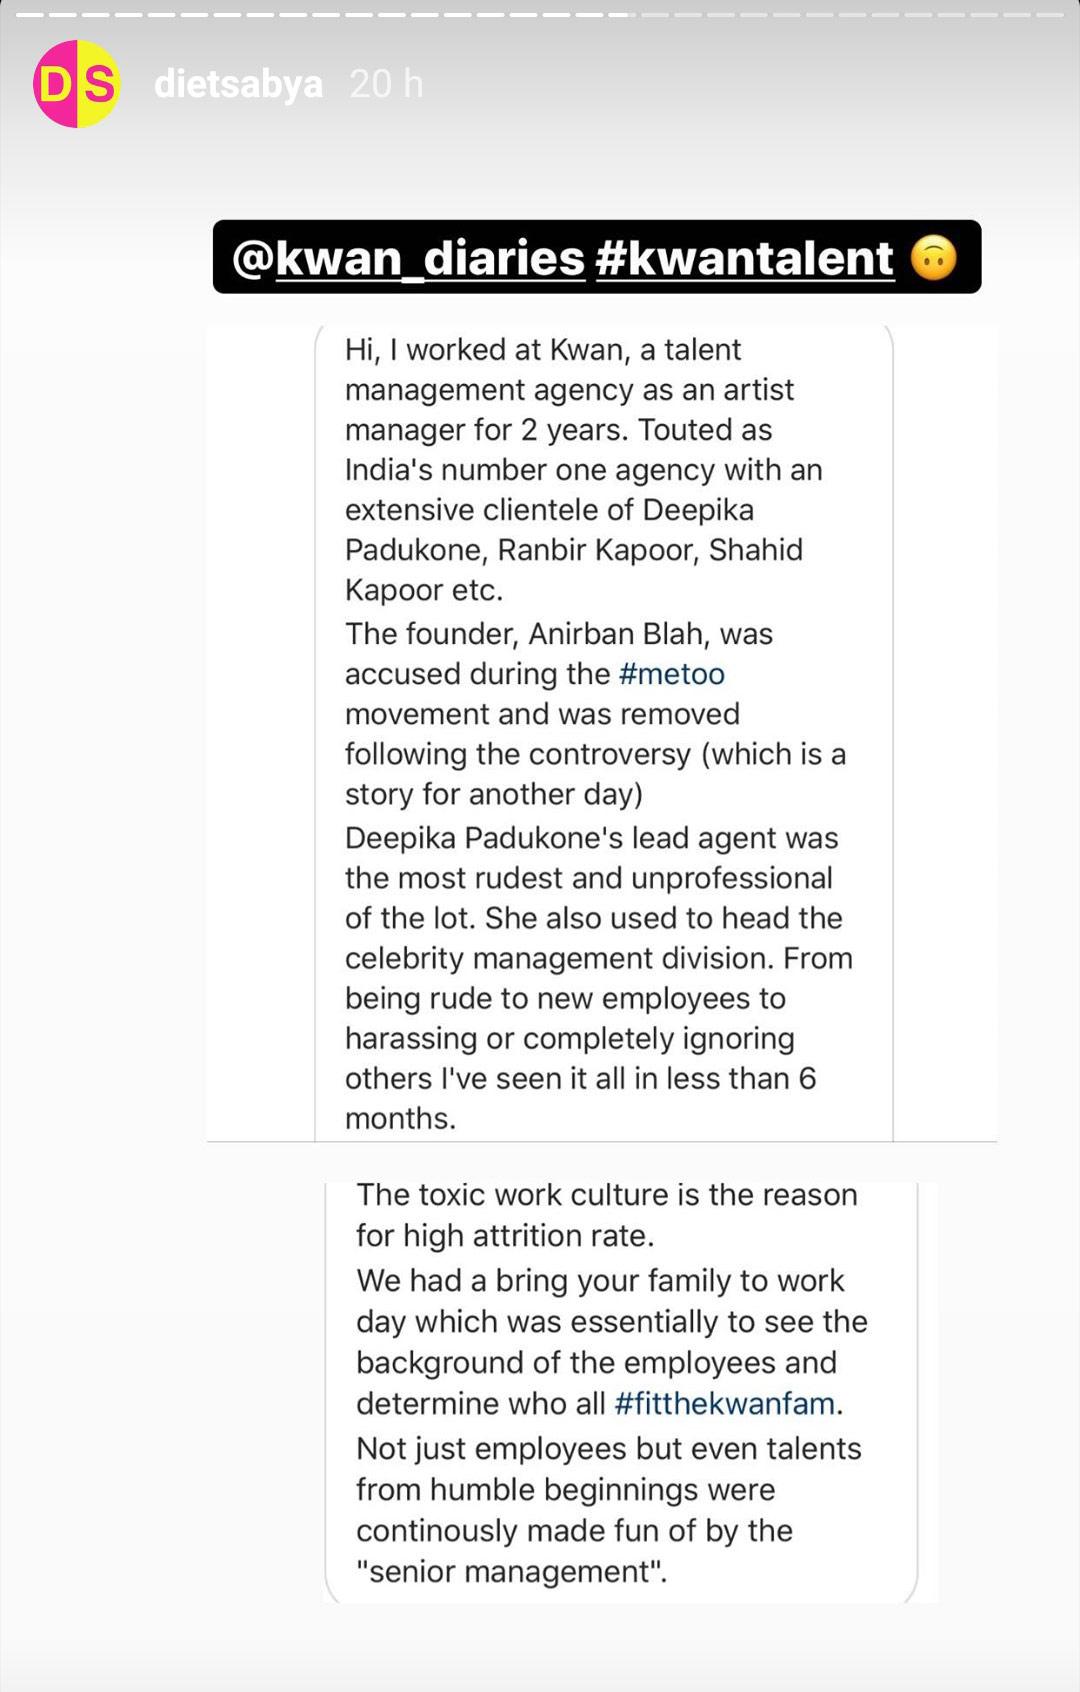 Diet Sabya calls out Deepika Padukone & Ranbir Kapoor's talent agency for harassment and toxic work environments (Photo credit: dietsabya / Instagram)